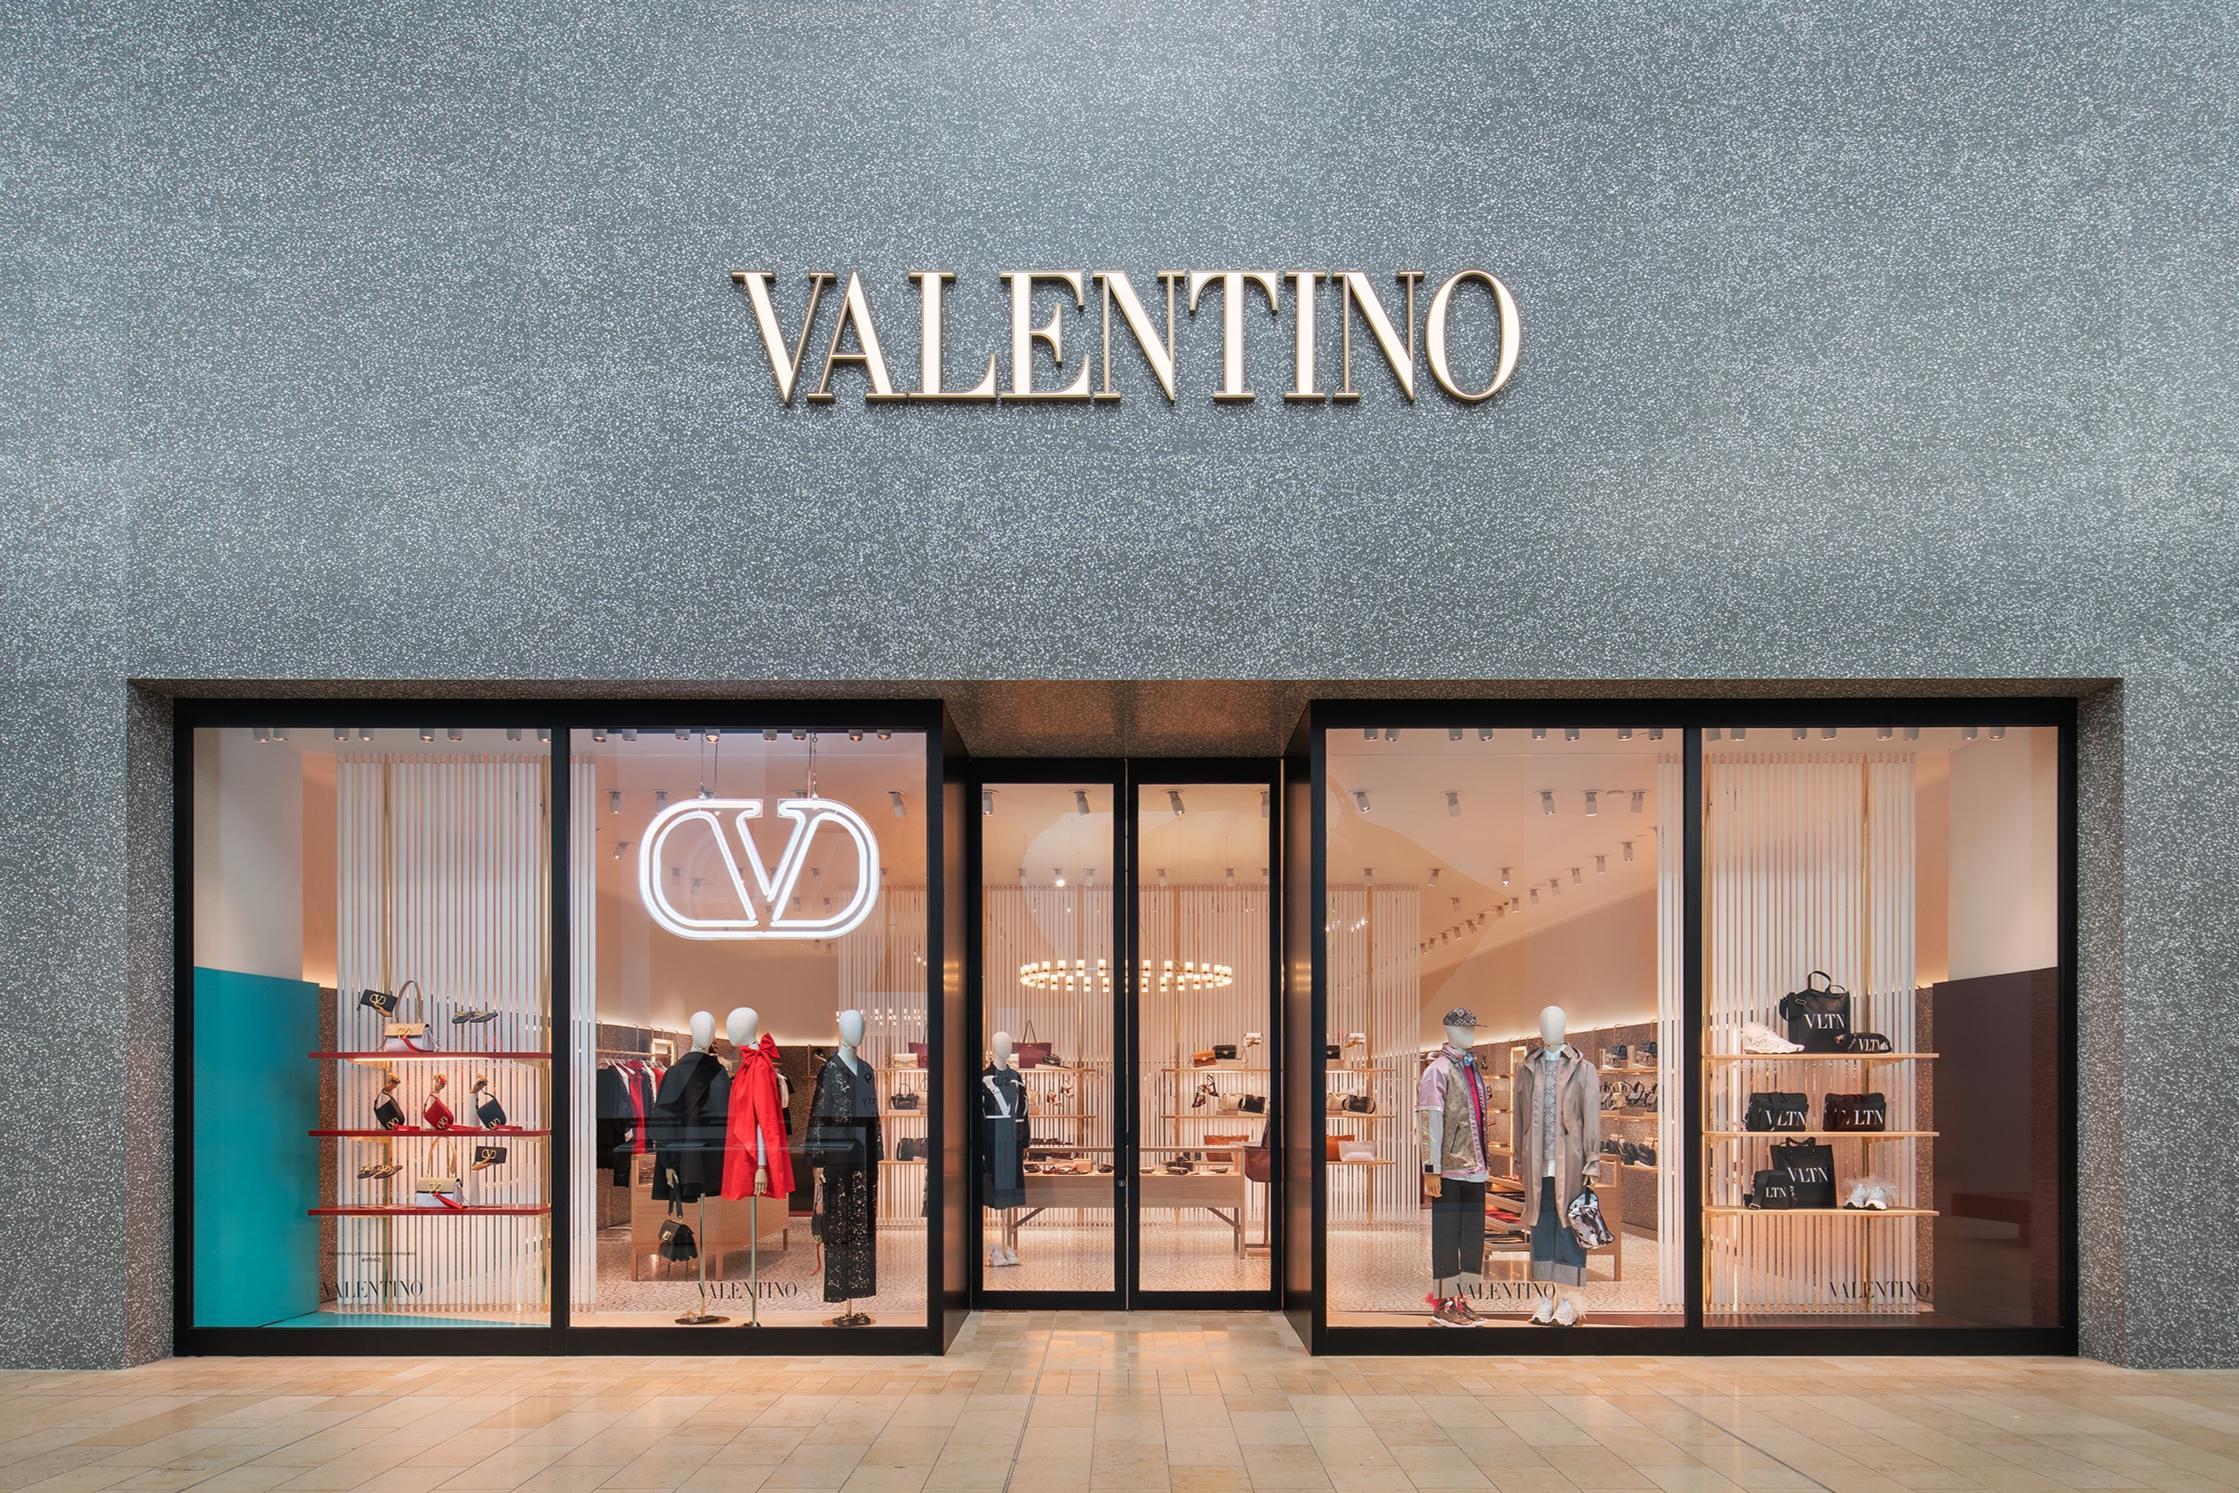 Valentino 01smlr.jpg